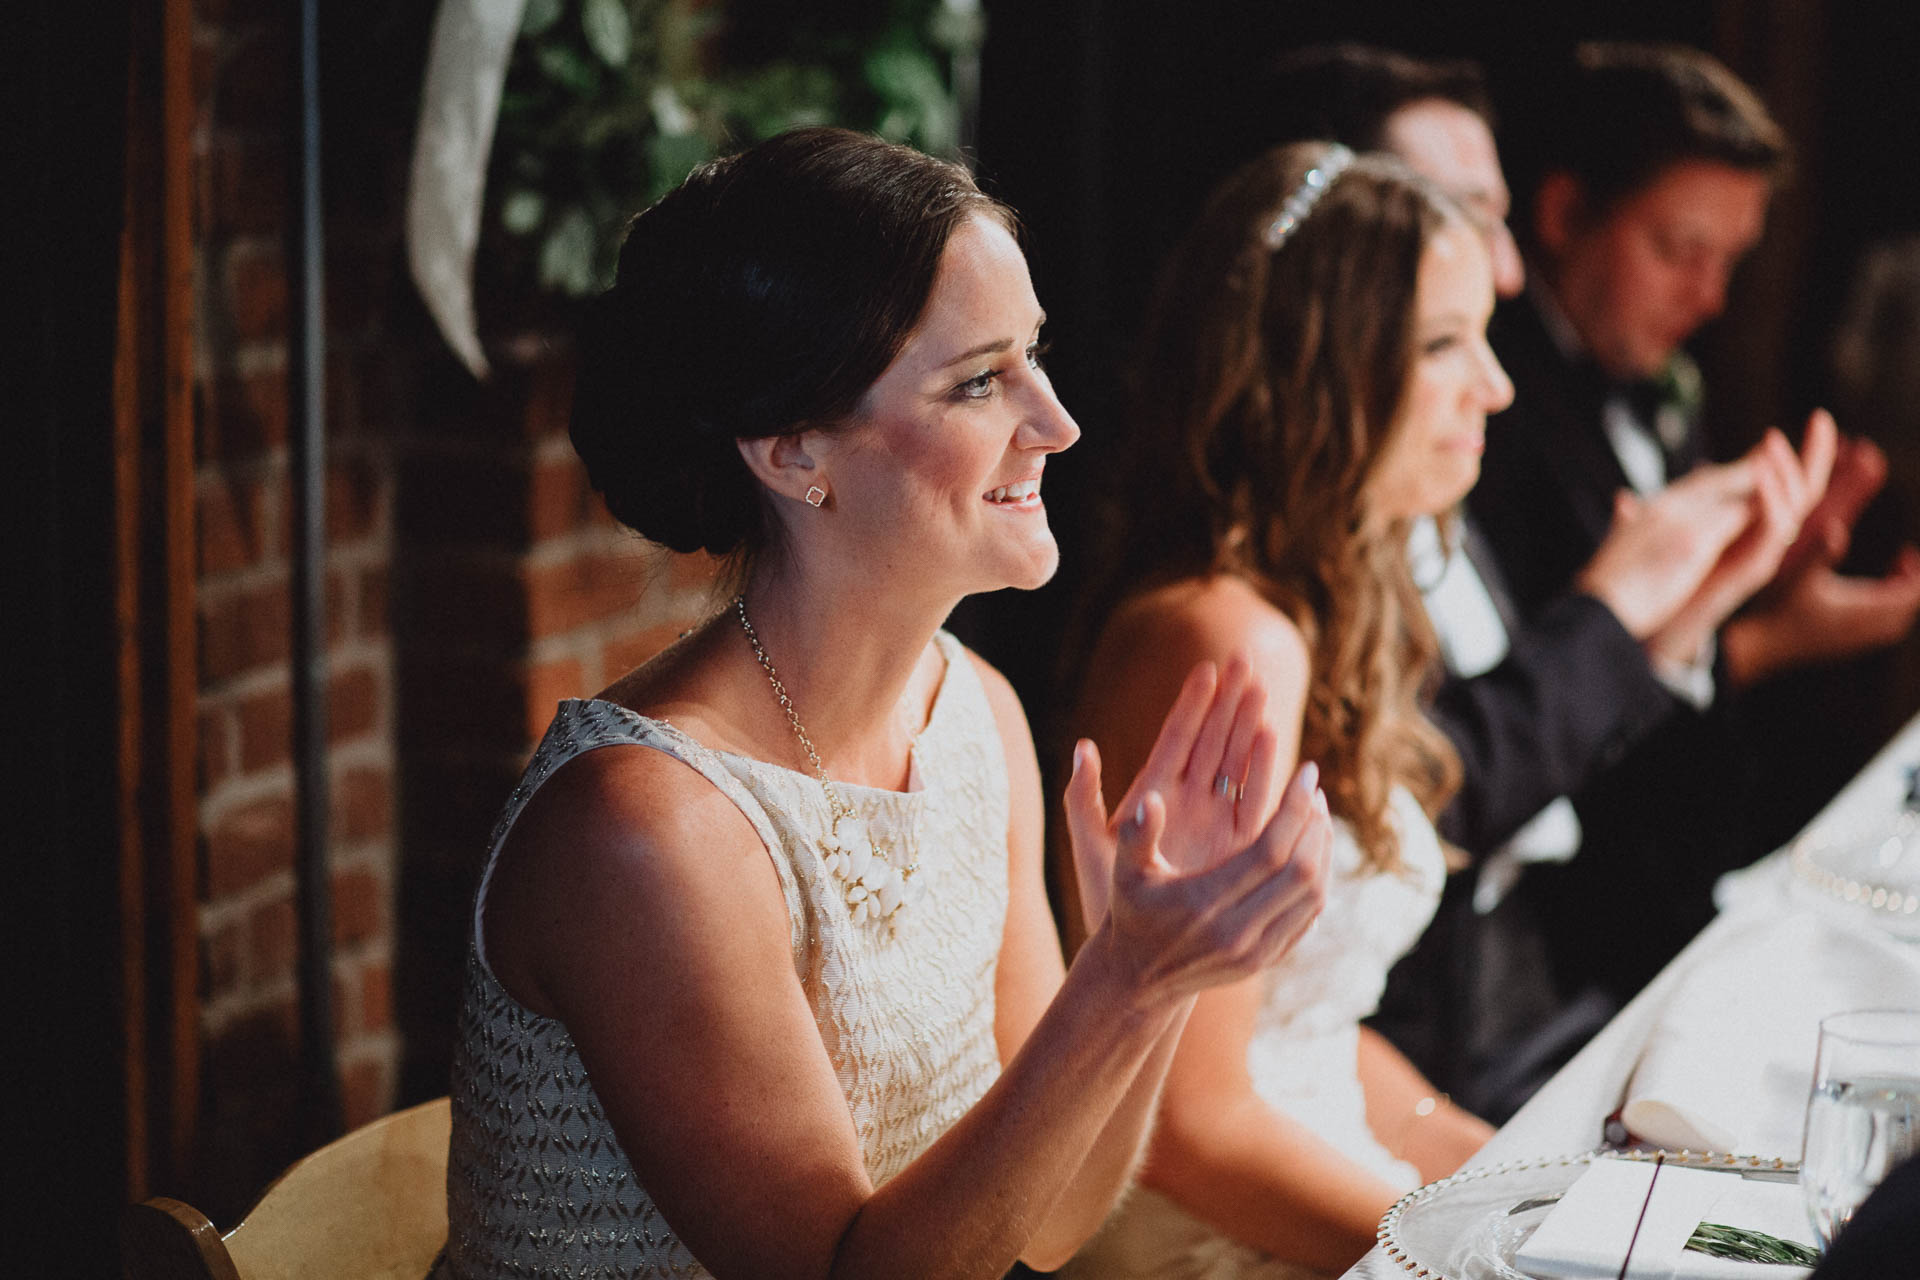 Keri-Joseph-Top-of-the-Market-Wedding-177@2x.jpg